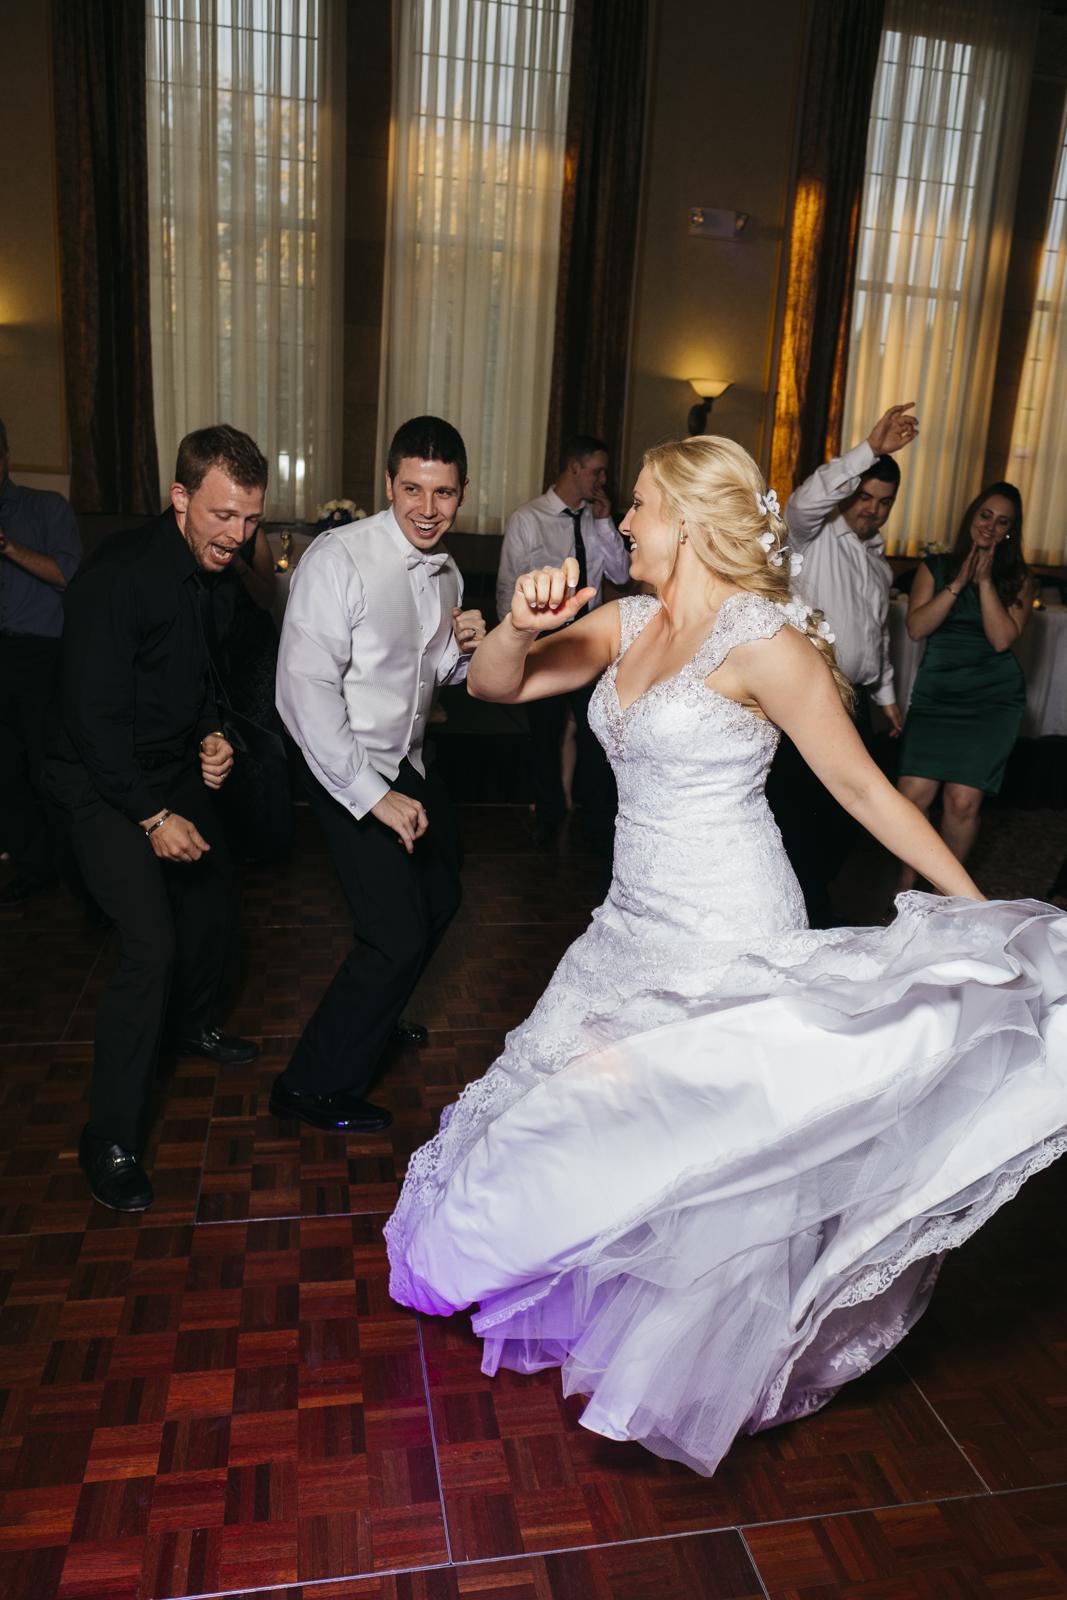 Bride and groom dancing at wedding reception.